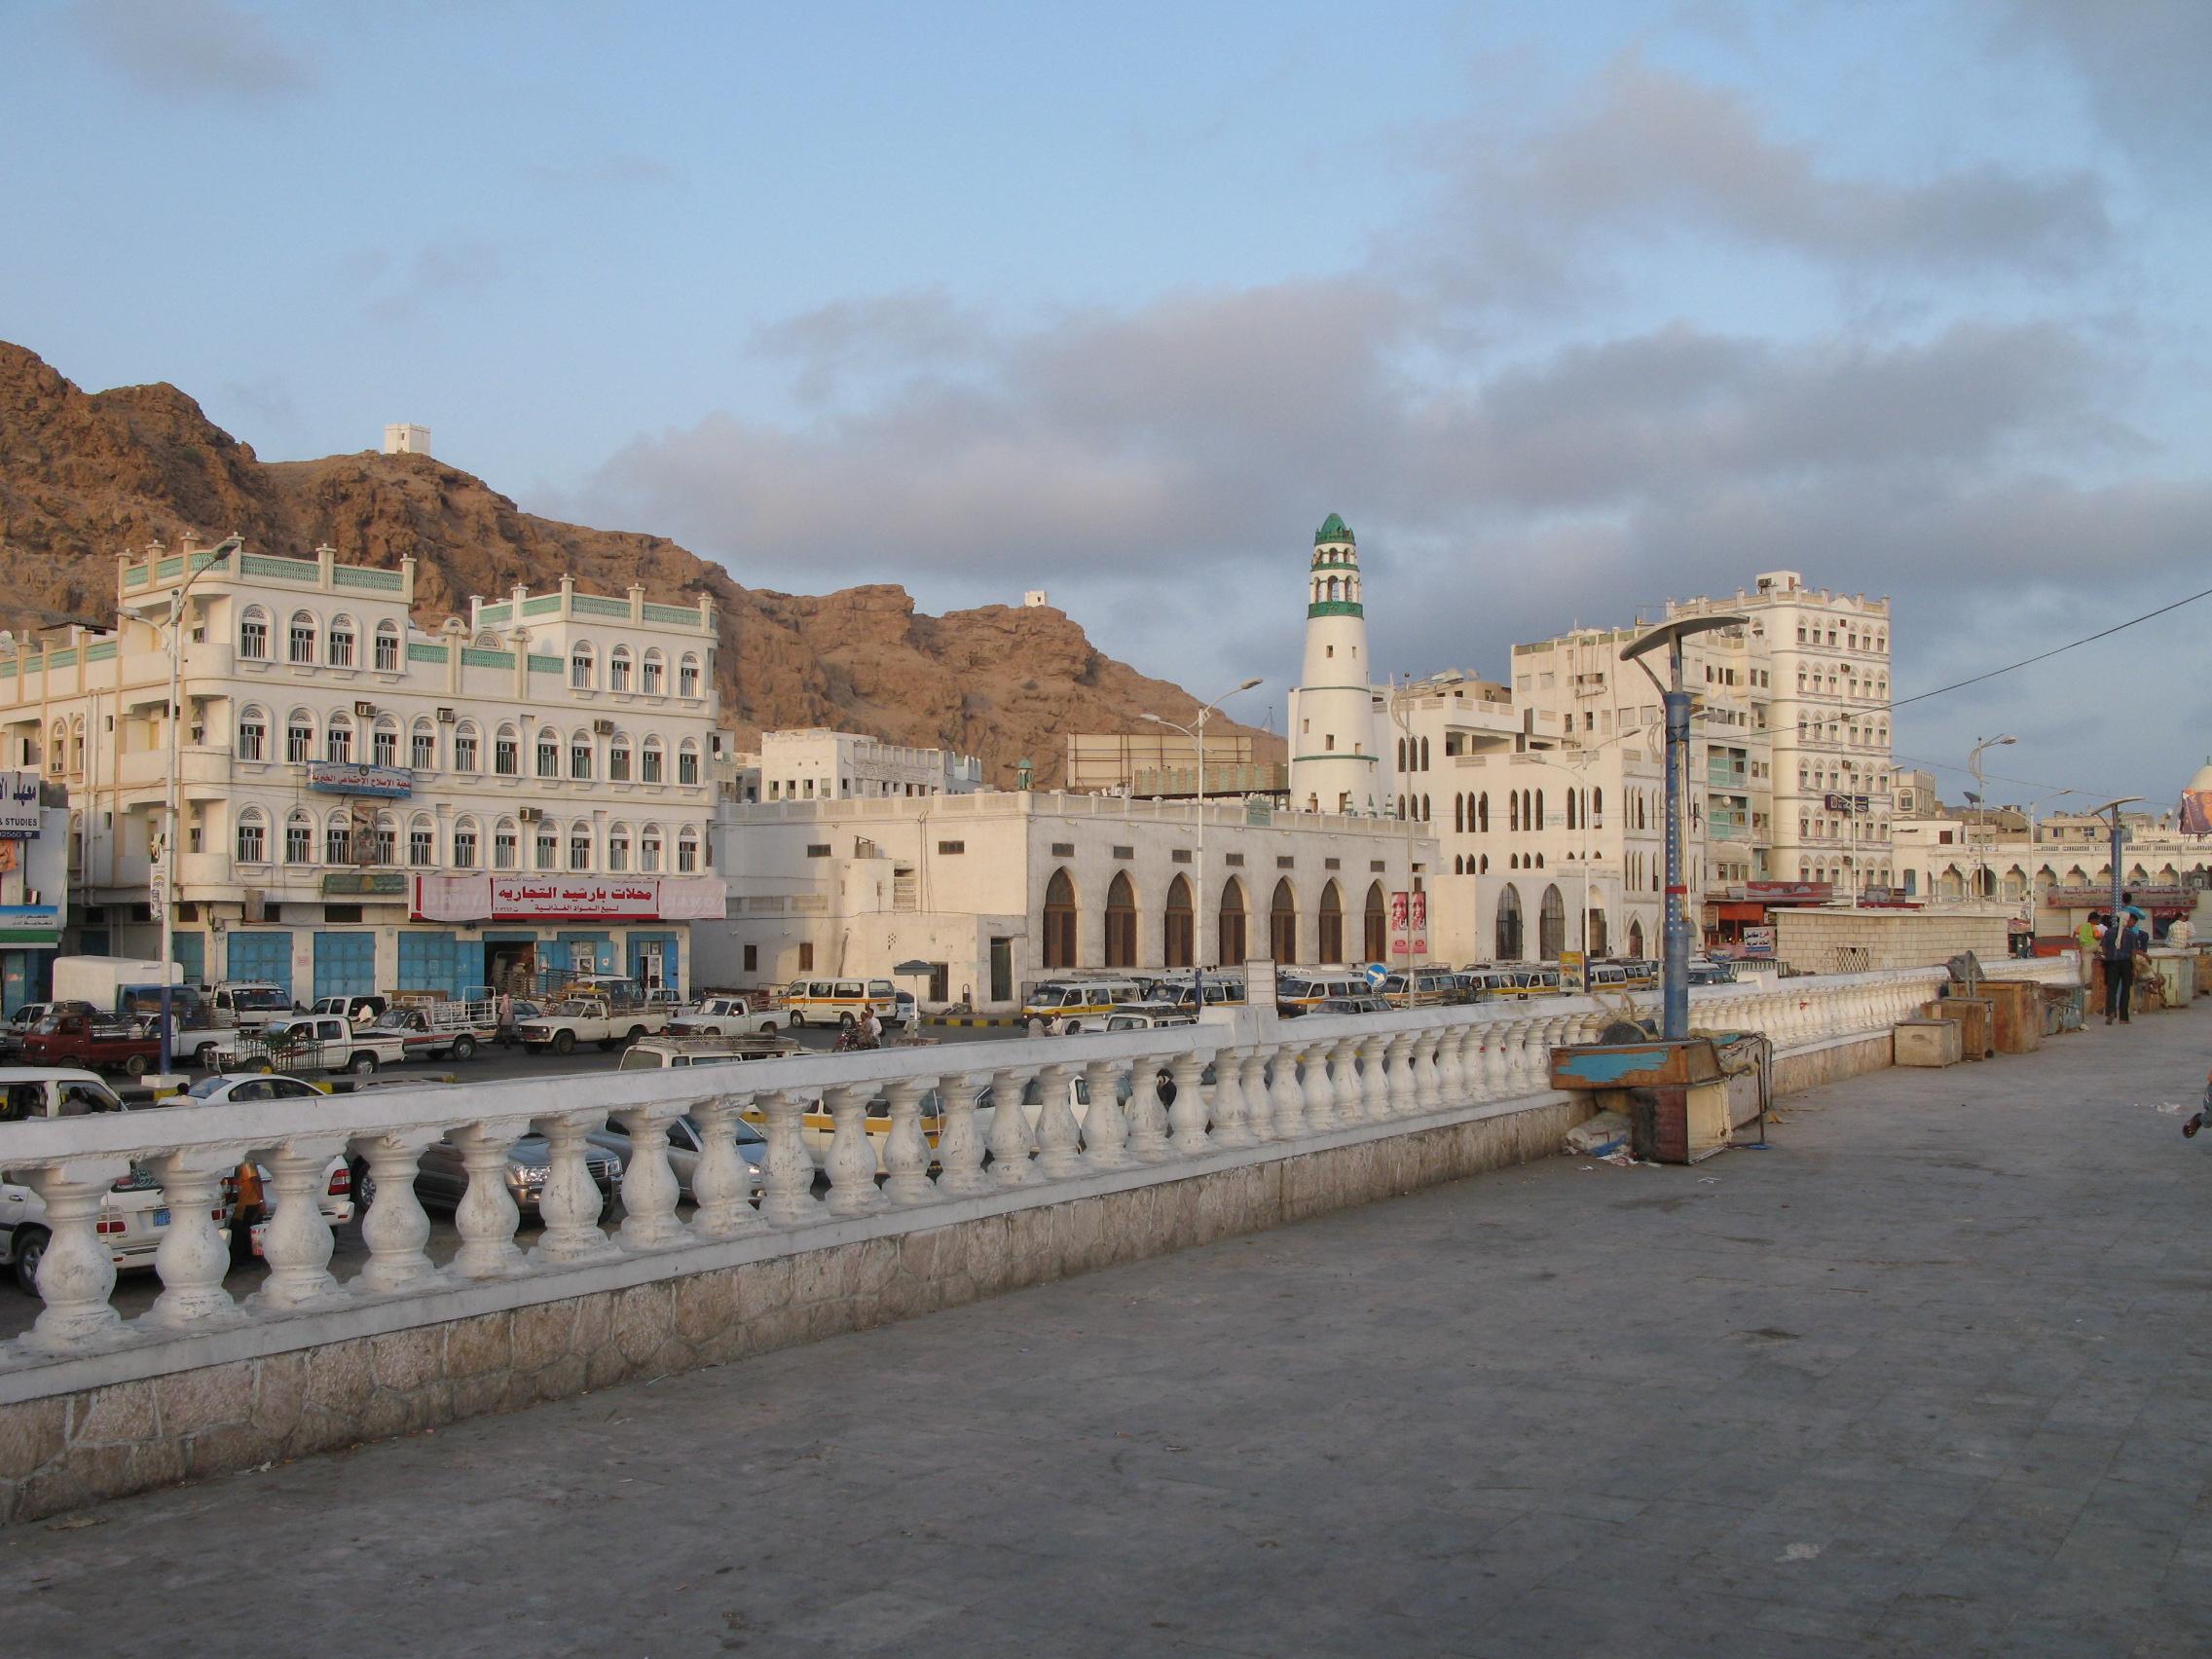 Al Mukalla, Yemen. Al Rawda Moaque Minaret in the center of the photo. Al-Ghwayzi Fort is visible in the upper left background. Photo taken by Ljuba Brank on April 30, 2008.